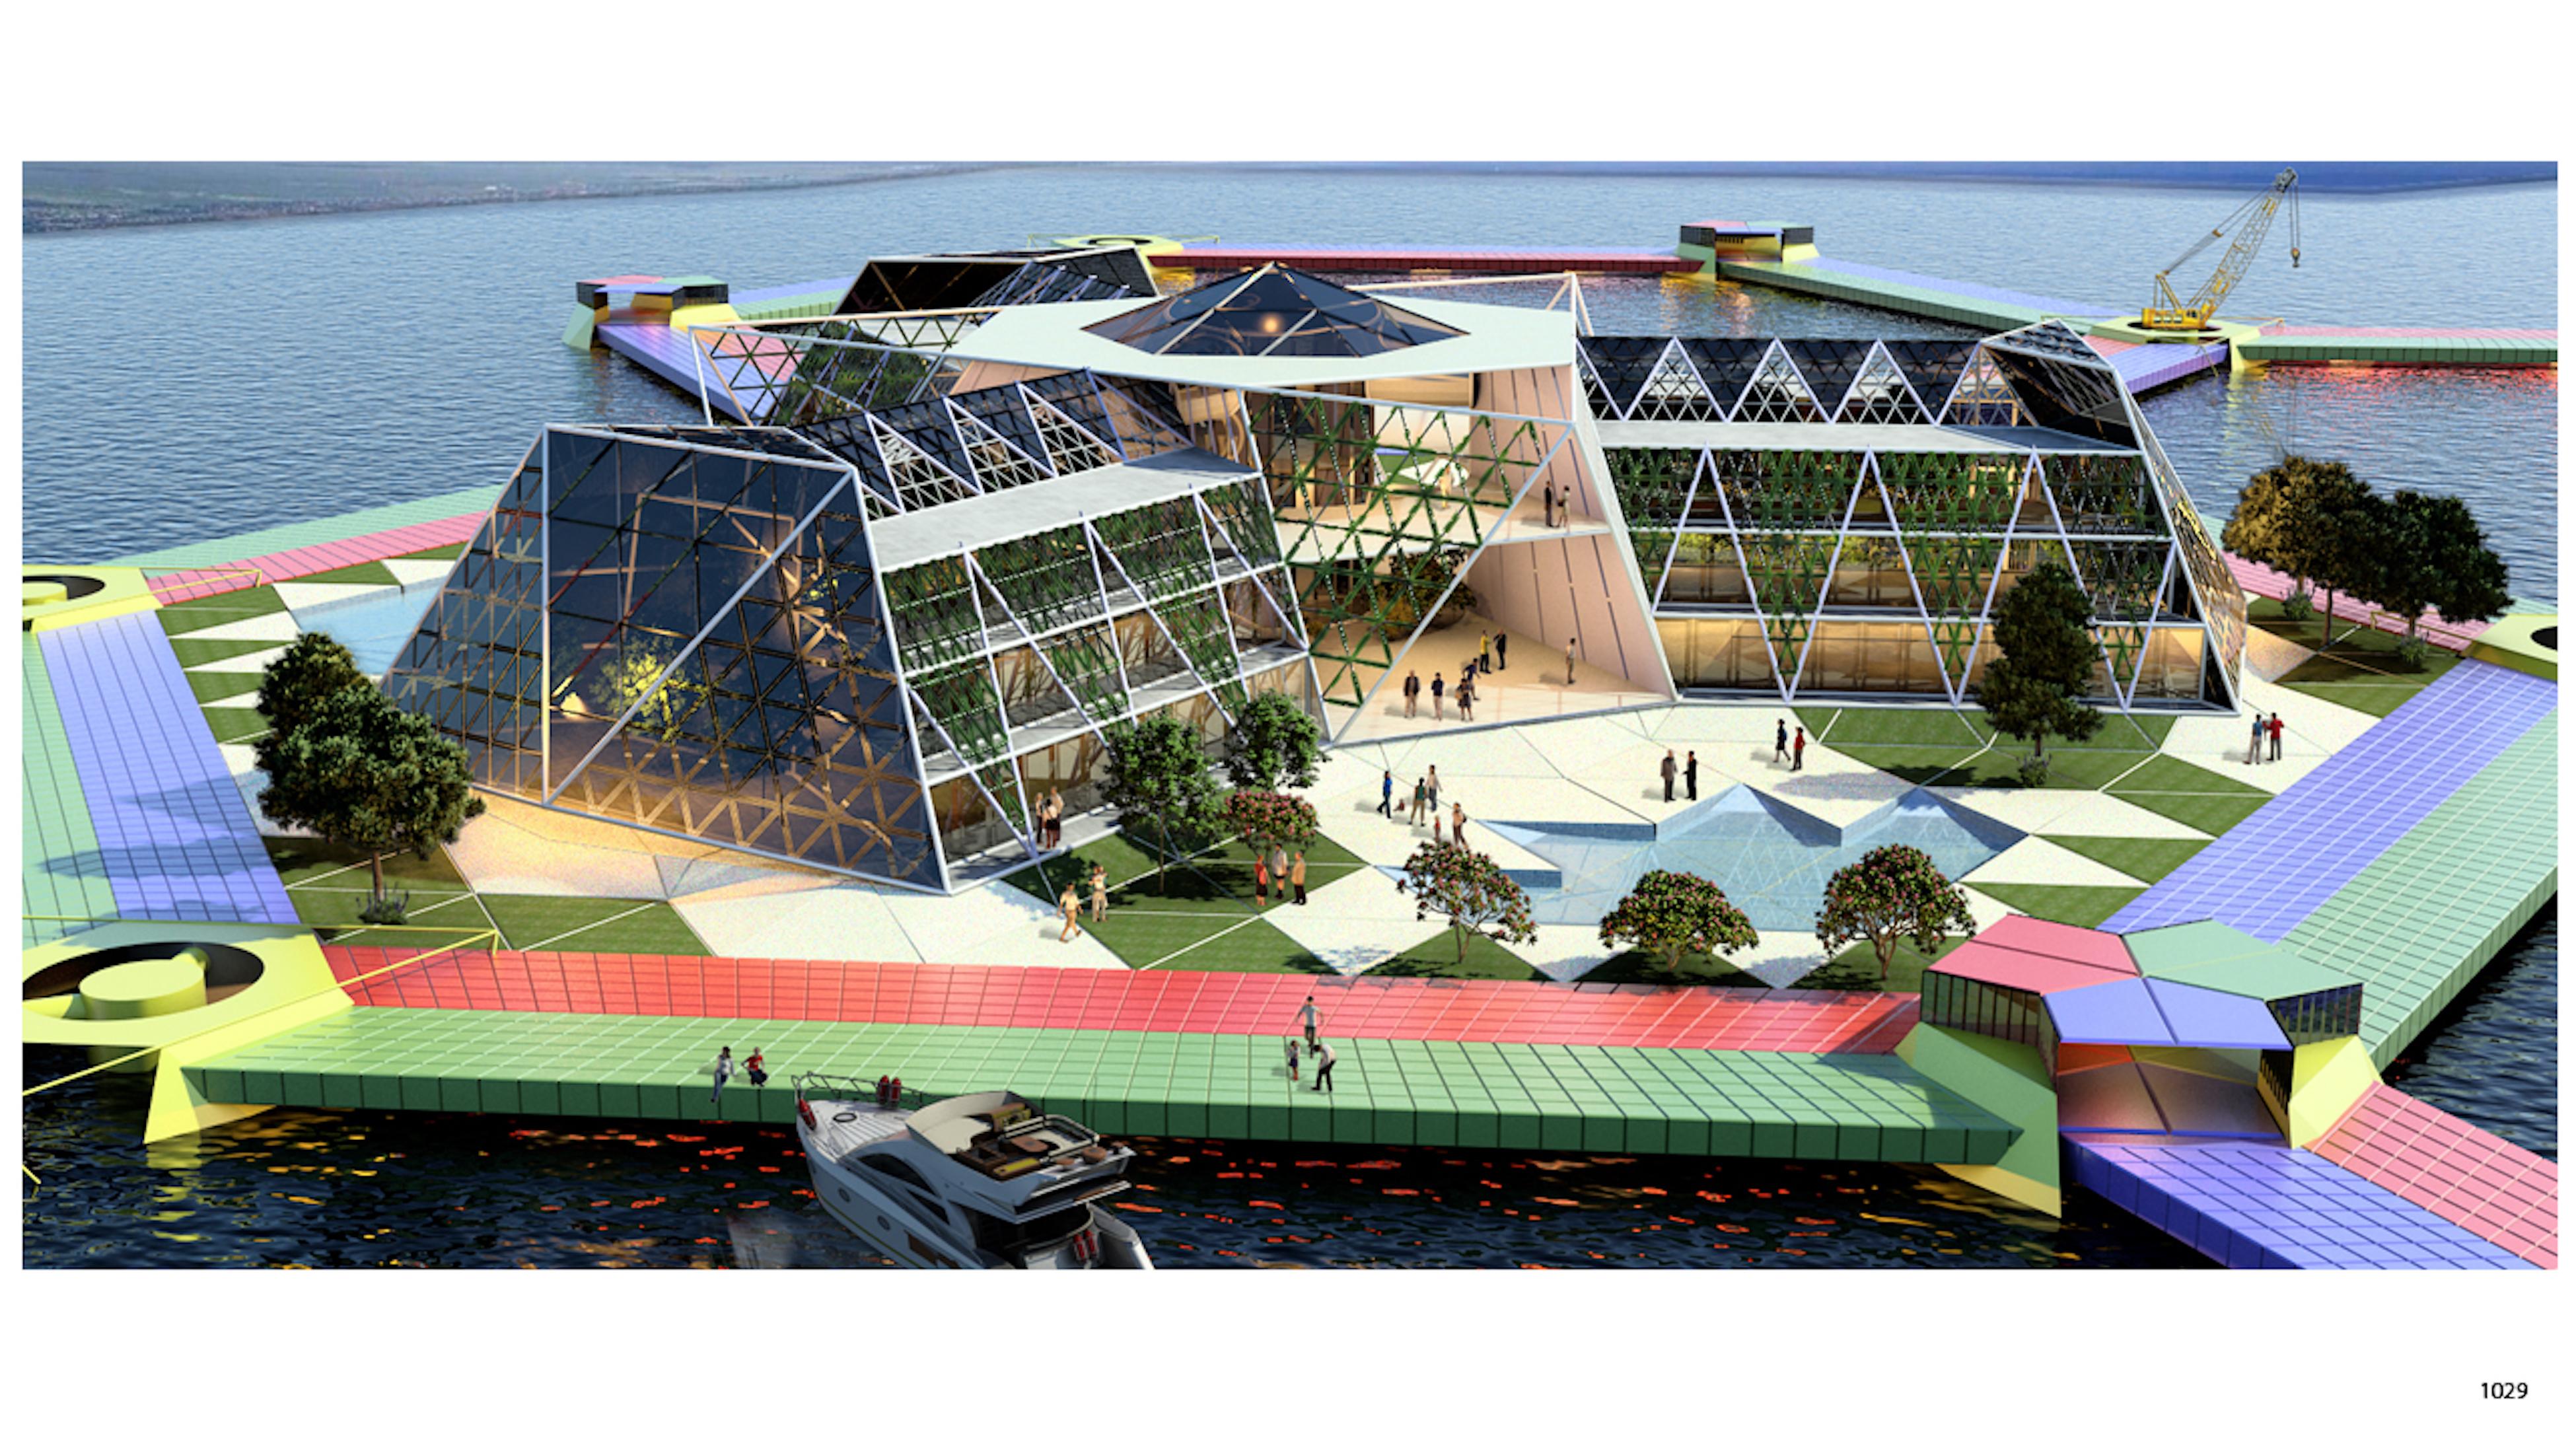 Prismatic-Module-Island-artist-concept-for-The-Seasteading-Institute-by-Matias-Perez-.jpg